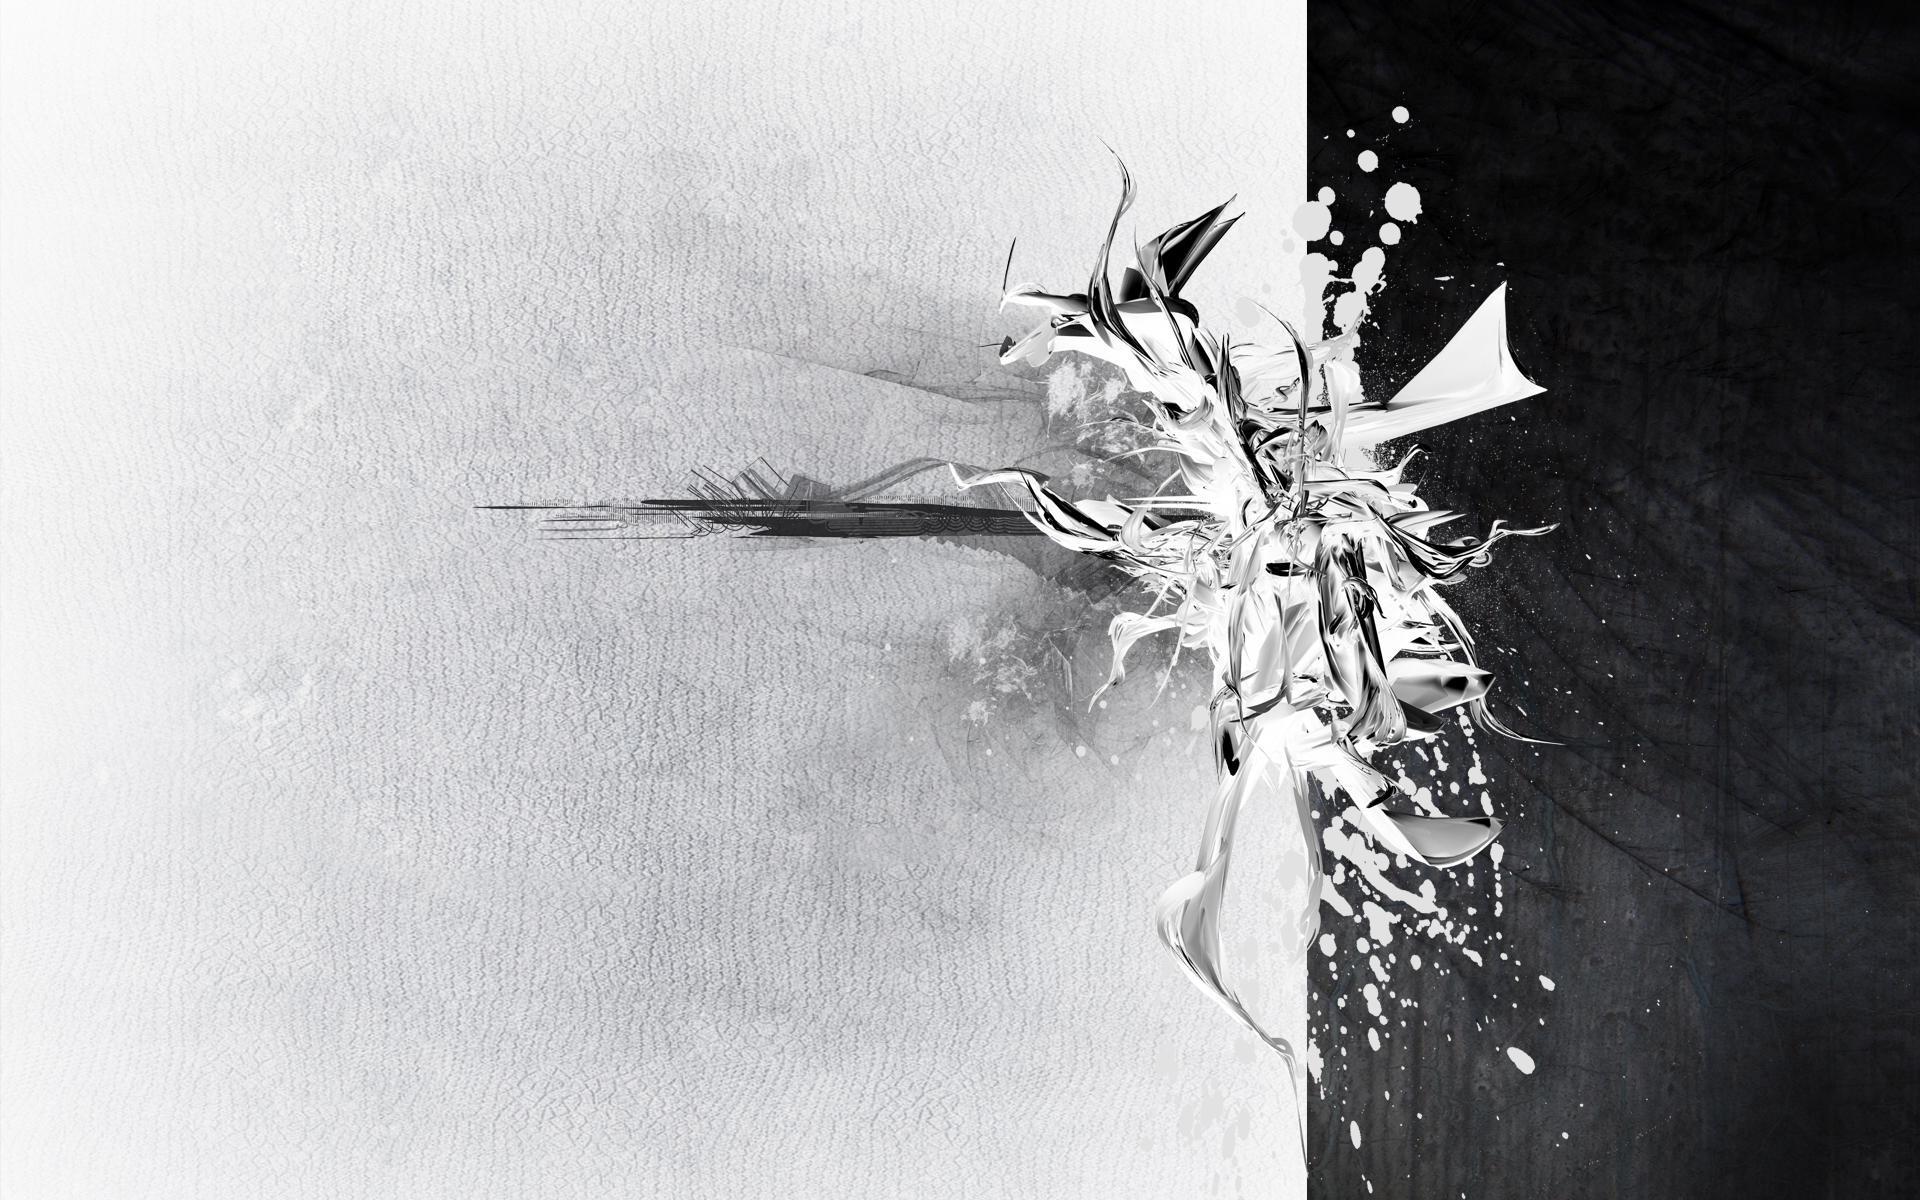 Black And White Design Wallpapers Hd: صور انستقرام ابيض واسود روعة بجودة HD